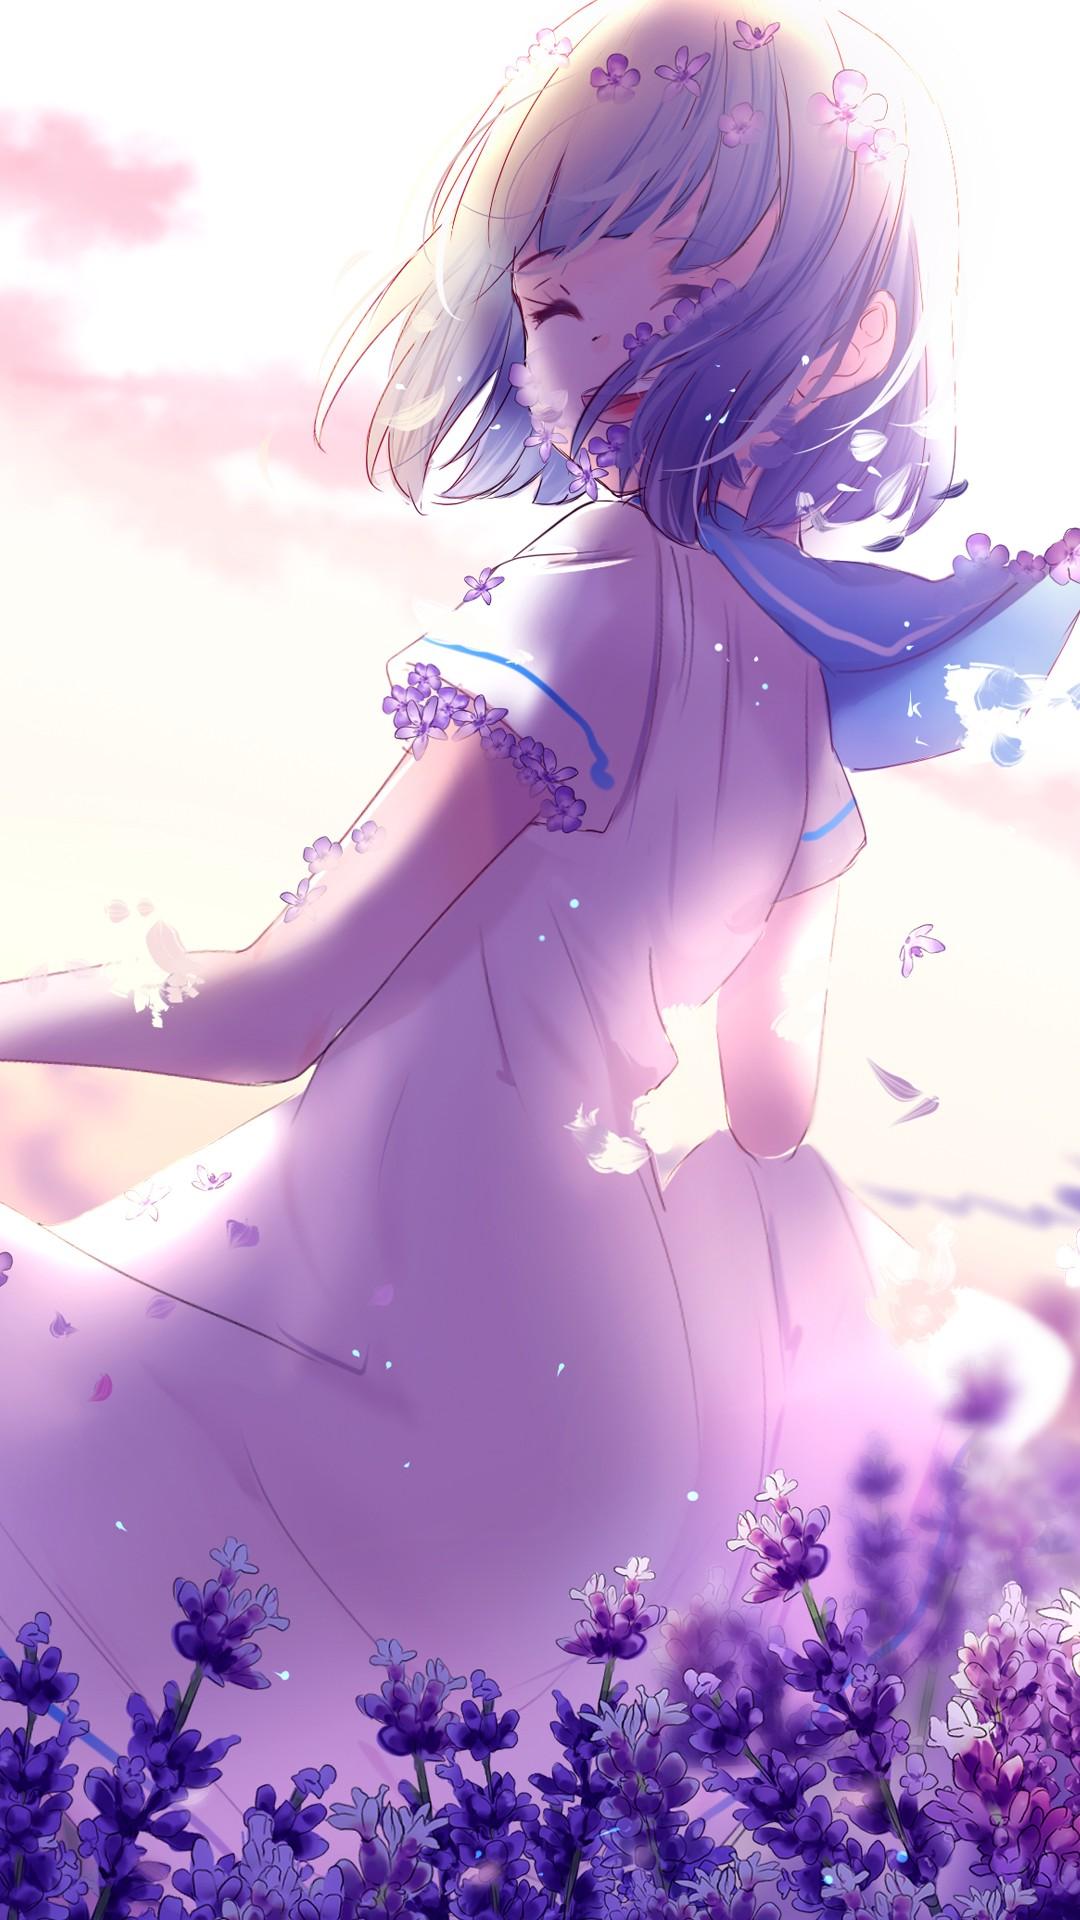 Wallpaper Iphone 5 Cute Purple Anime Girl Lavender Purple Flowers 4k Wallpapers Hd